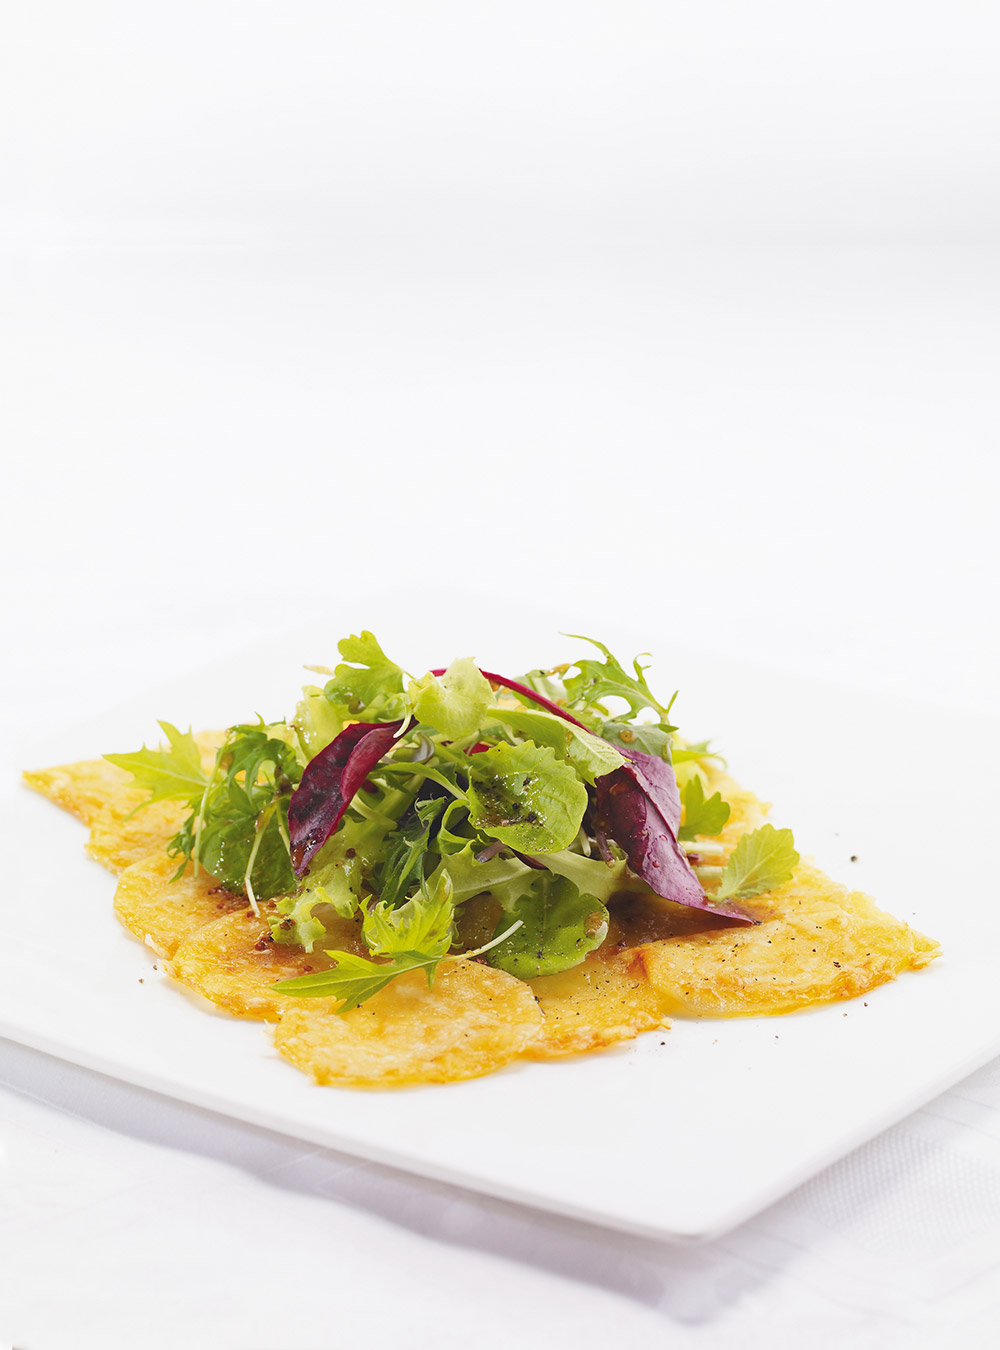 Tarte fine de pommes de terre et fromage gruyère | ricardo